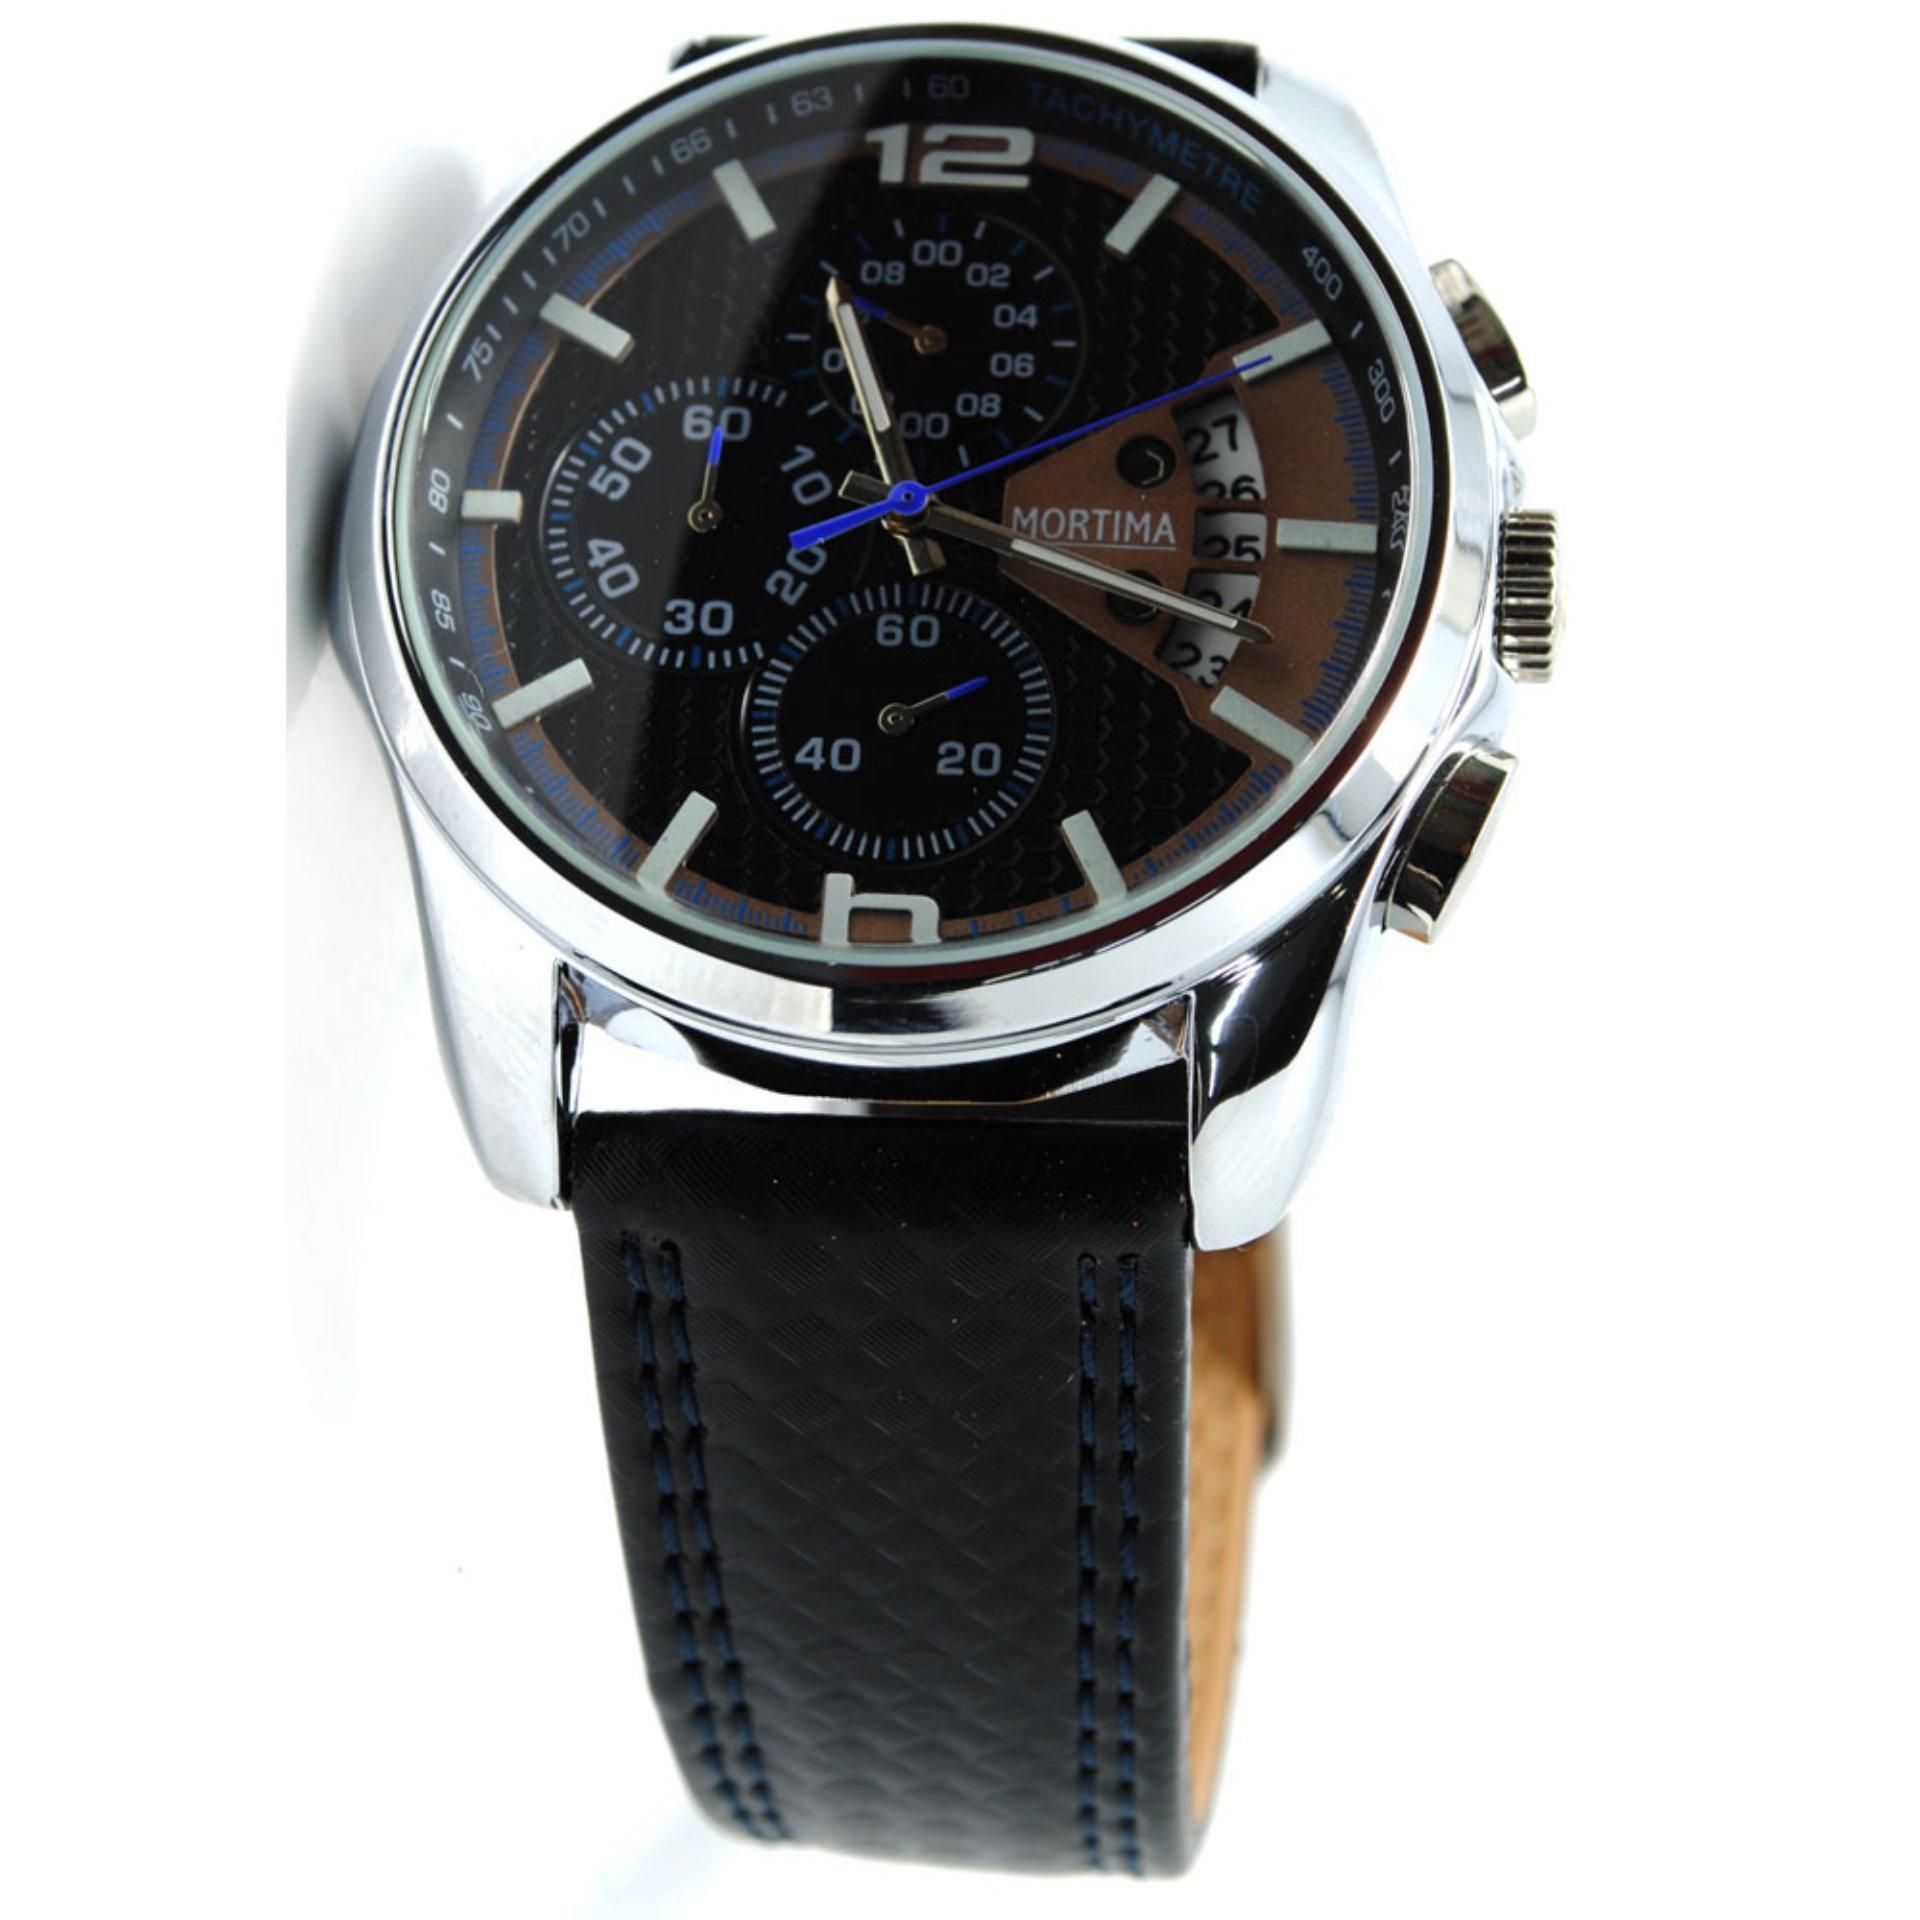 Skmei Men Sport Casual Anti Air Water Resistant Wr 30m 9106cl Jam Tangan Pria Watch 1208 Mortima Leather Strap Black